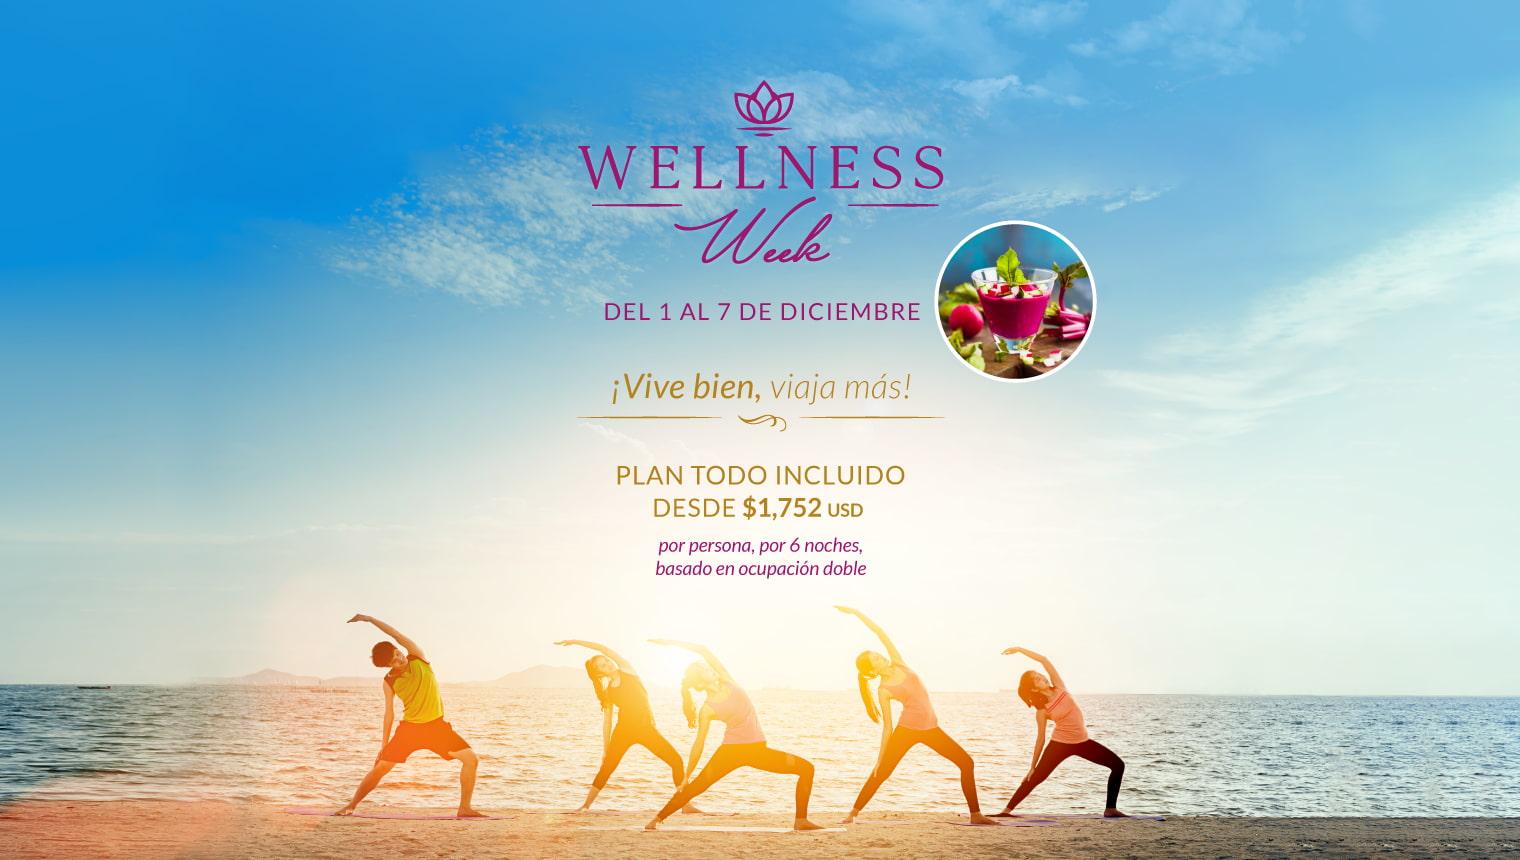 Wellness Week